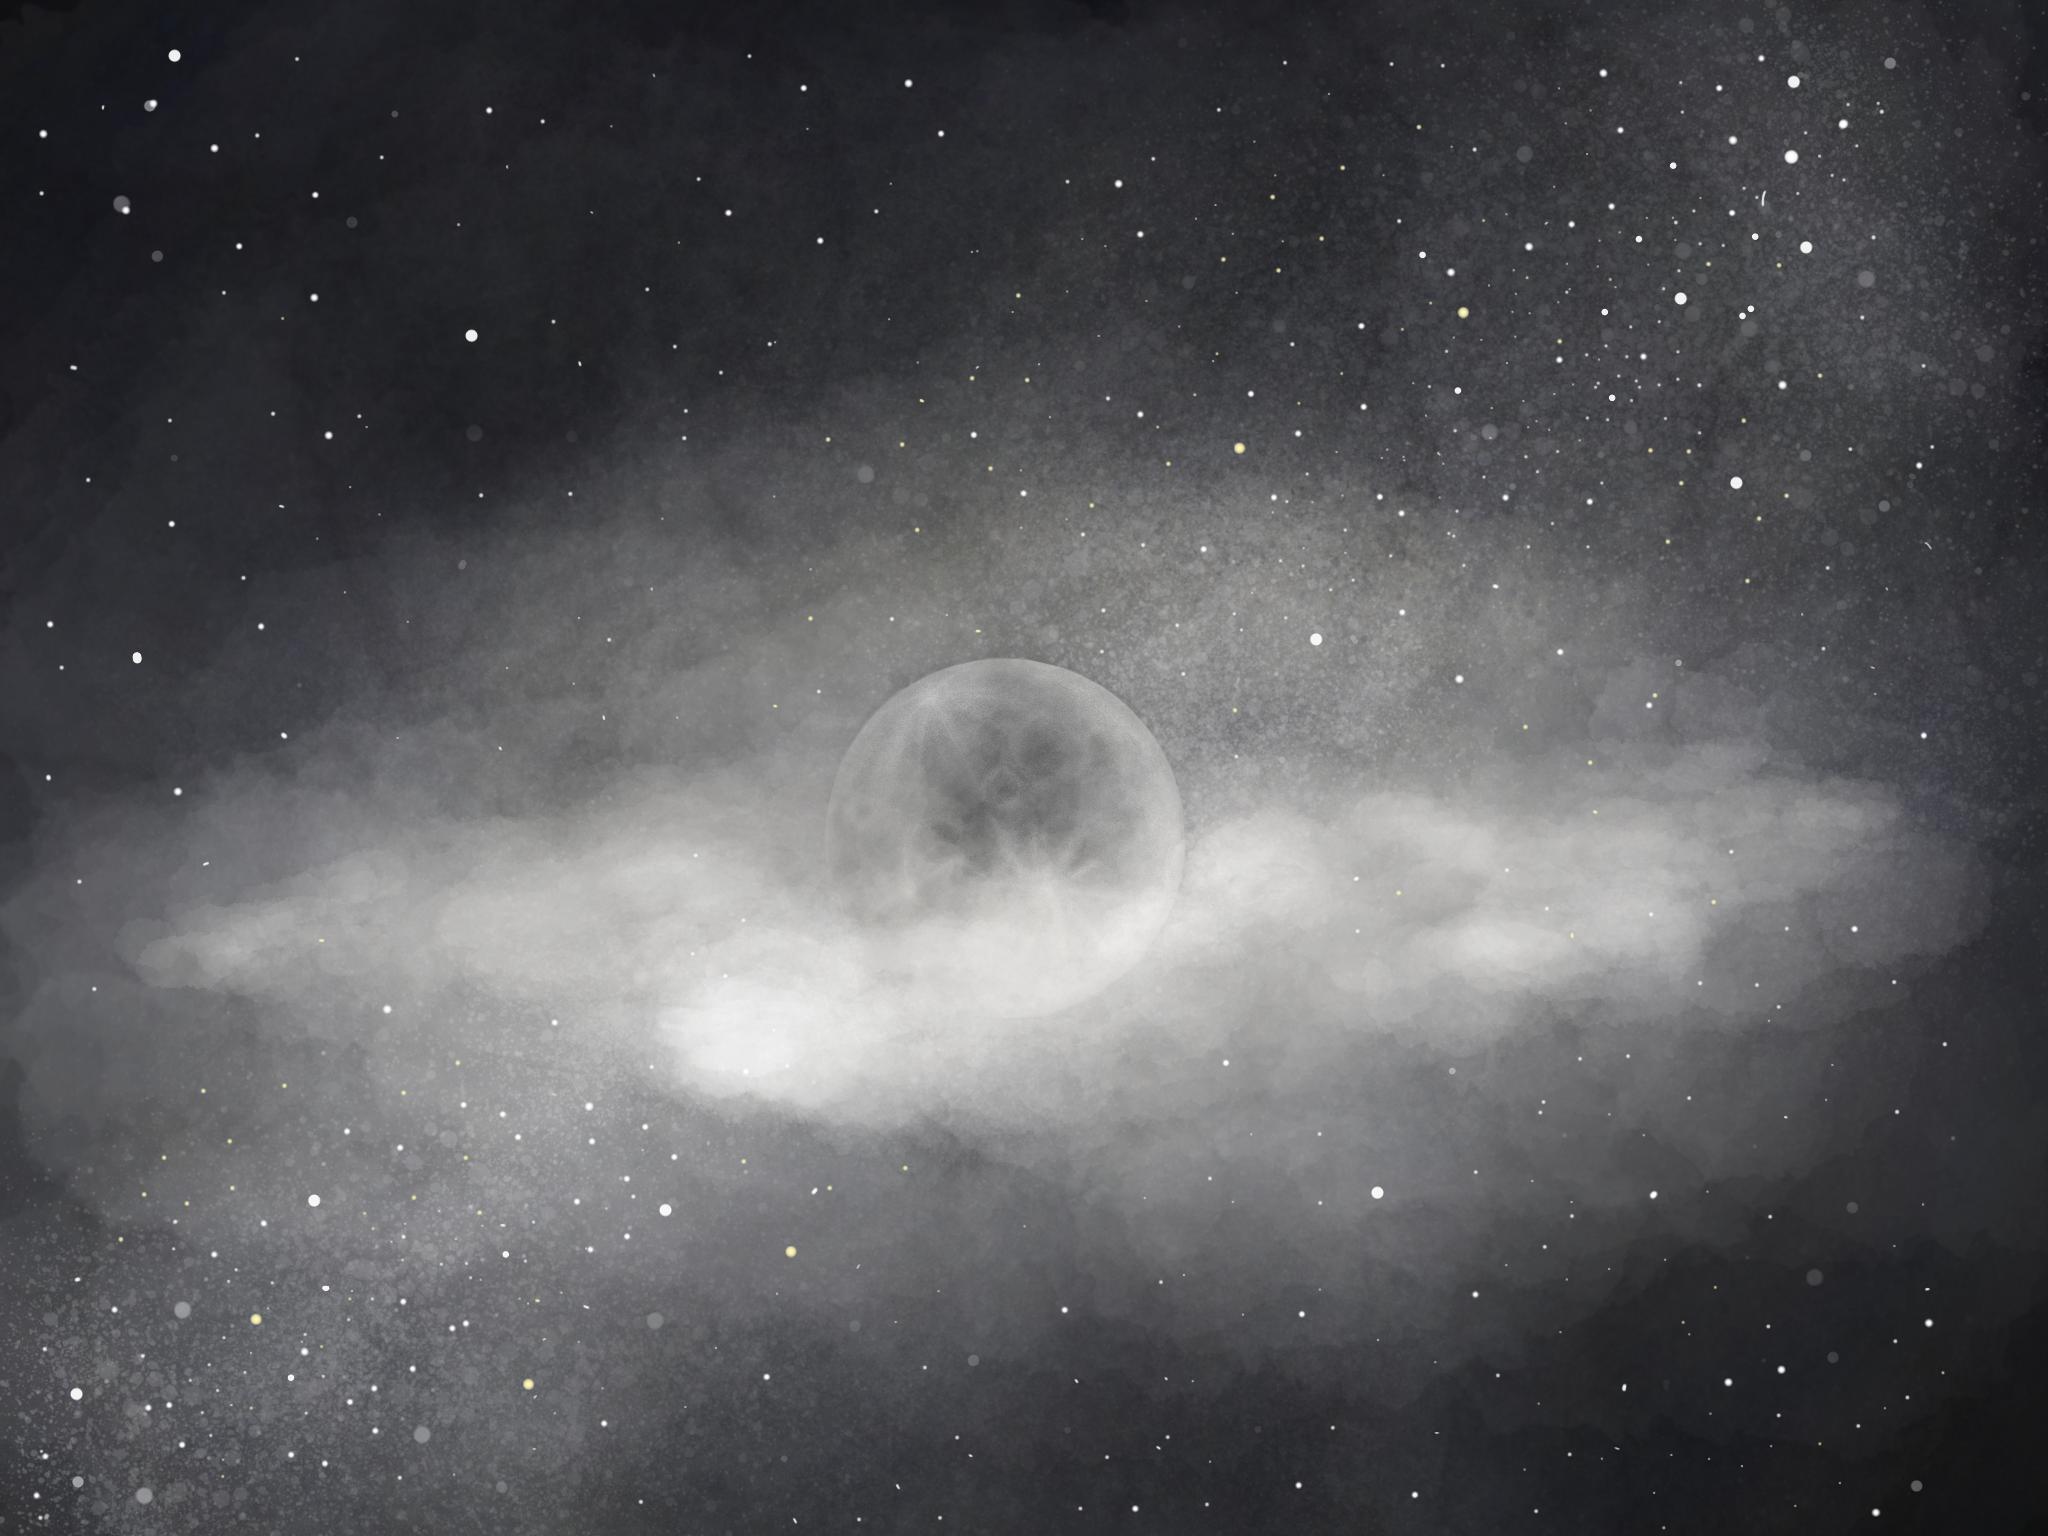 ipad pro手绘夜空壁纸图片